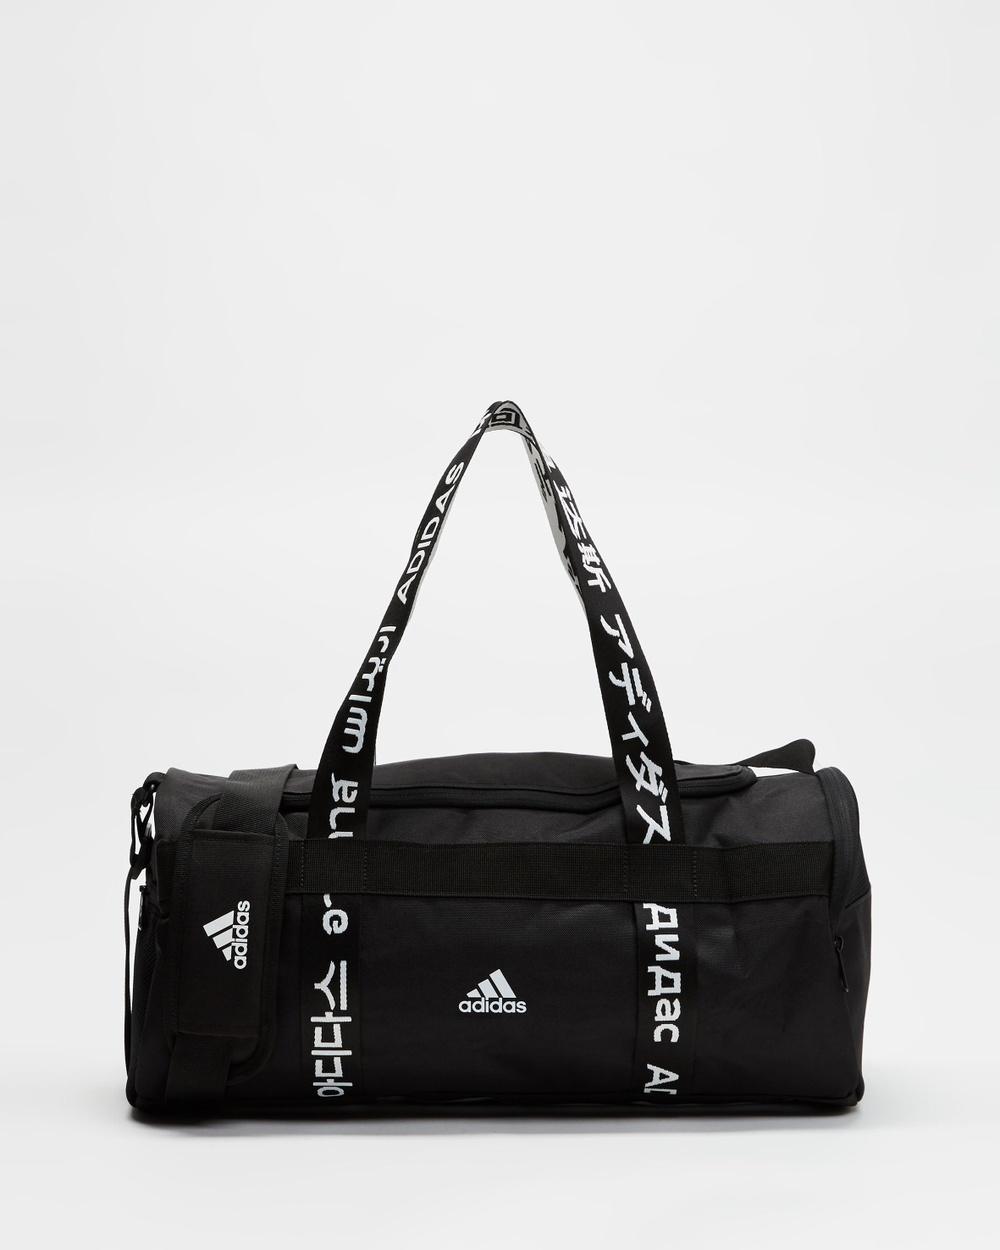 adidas Performance 4ATHLTS Small Duffle Bag Bags Black & White